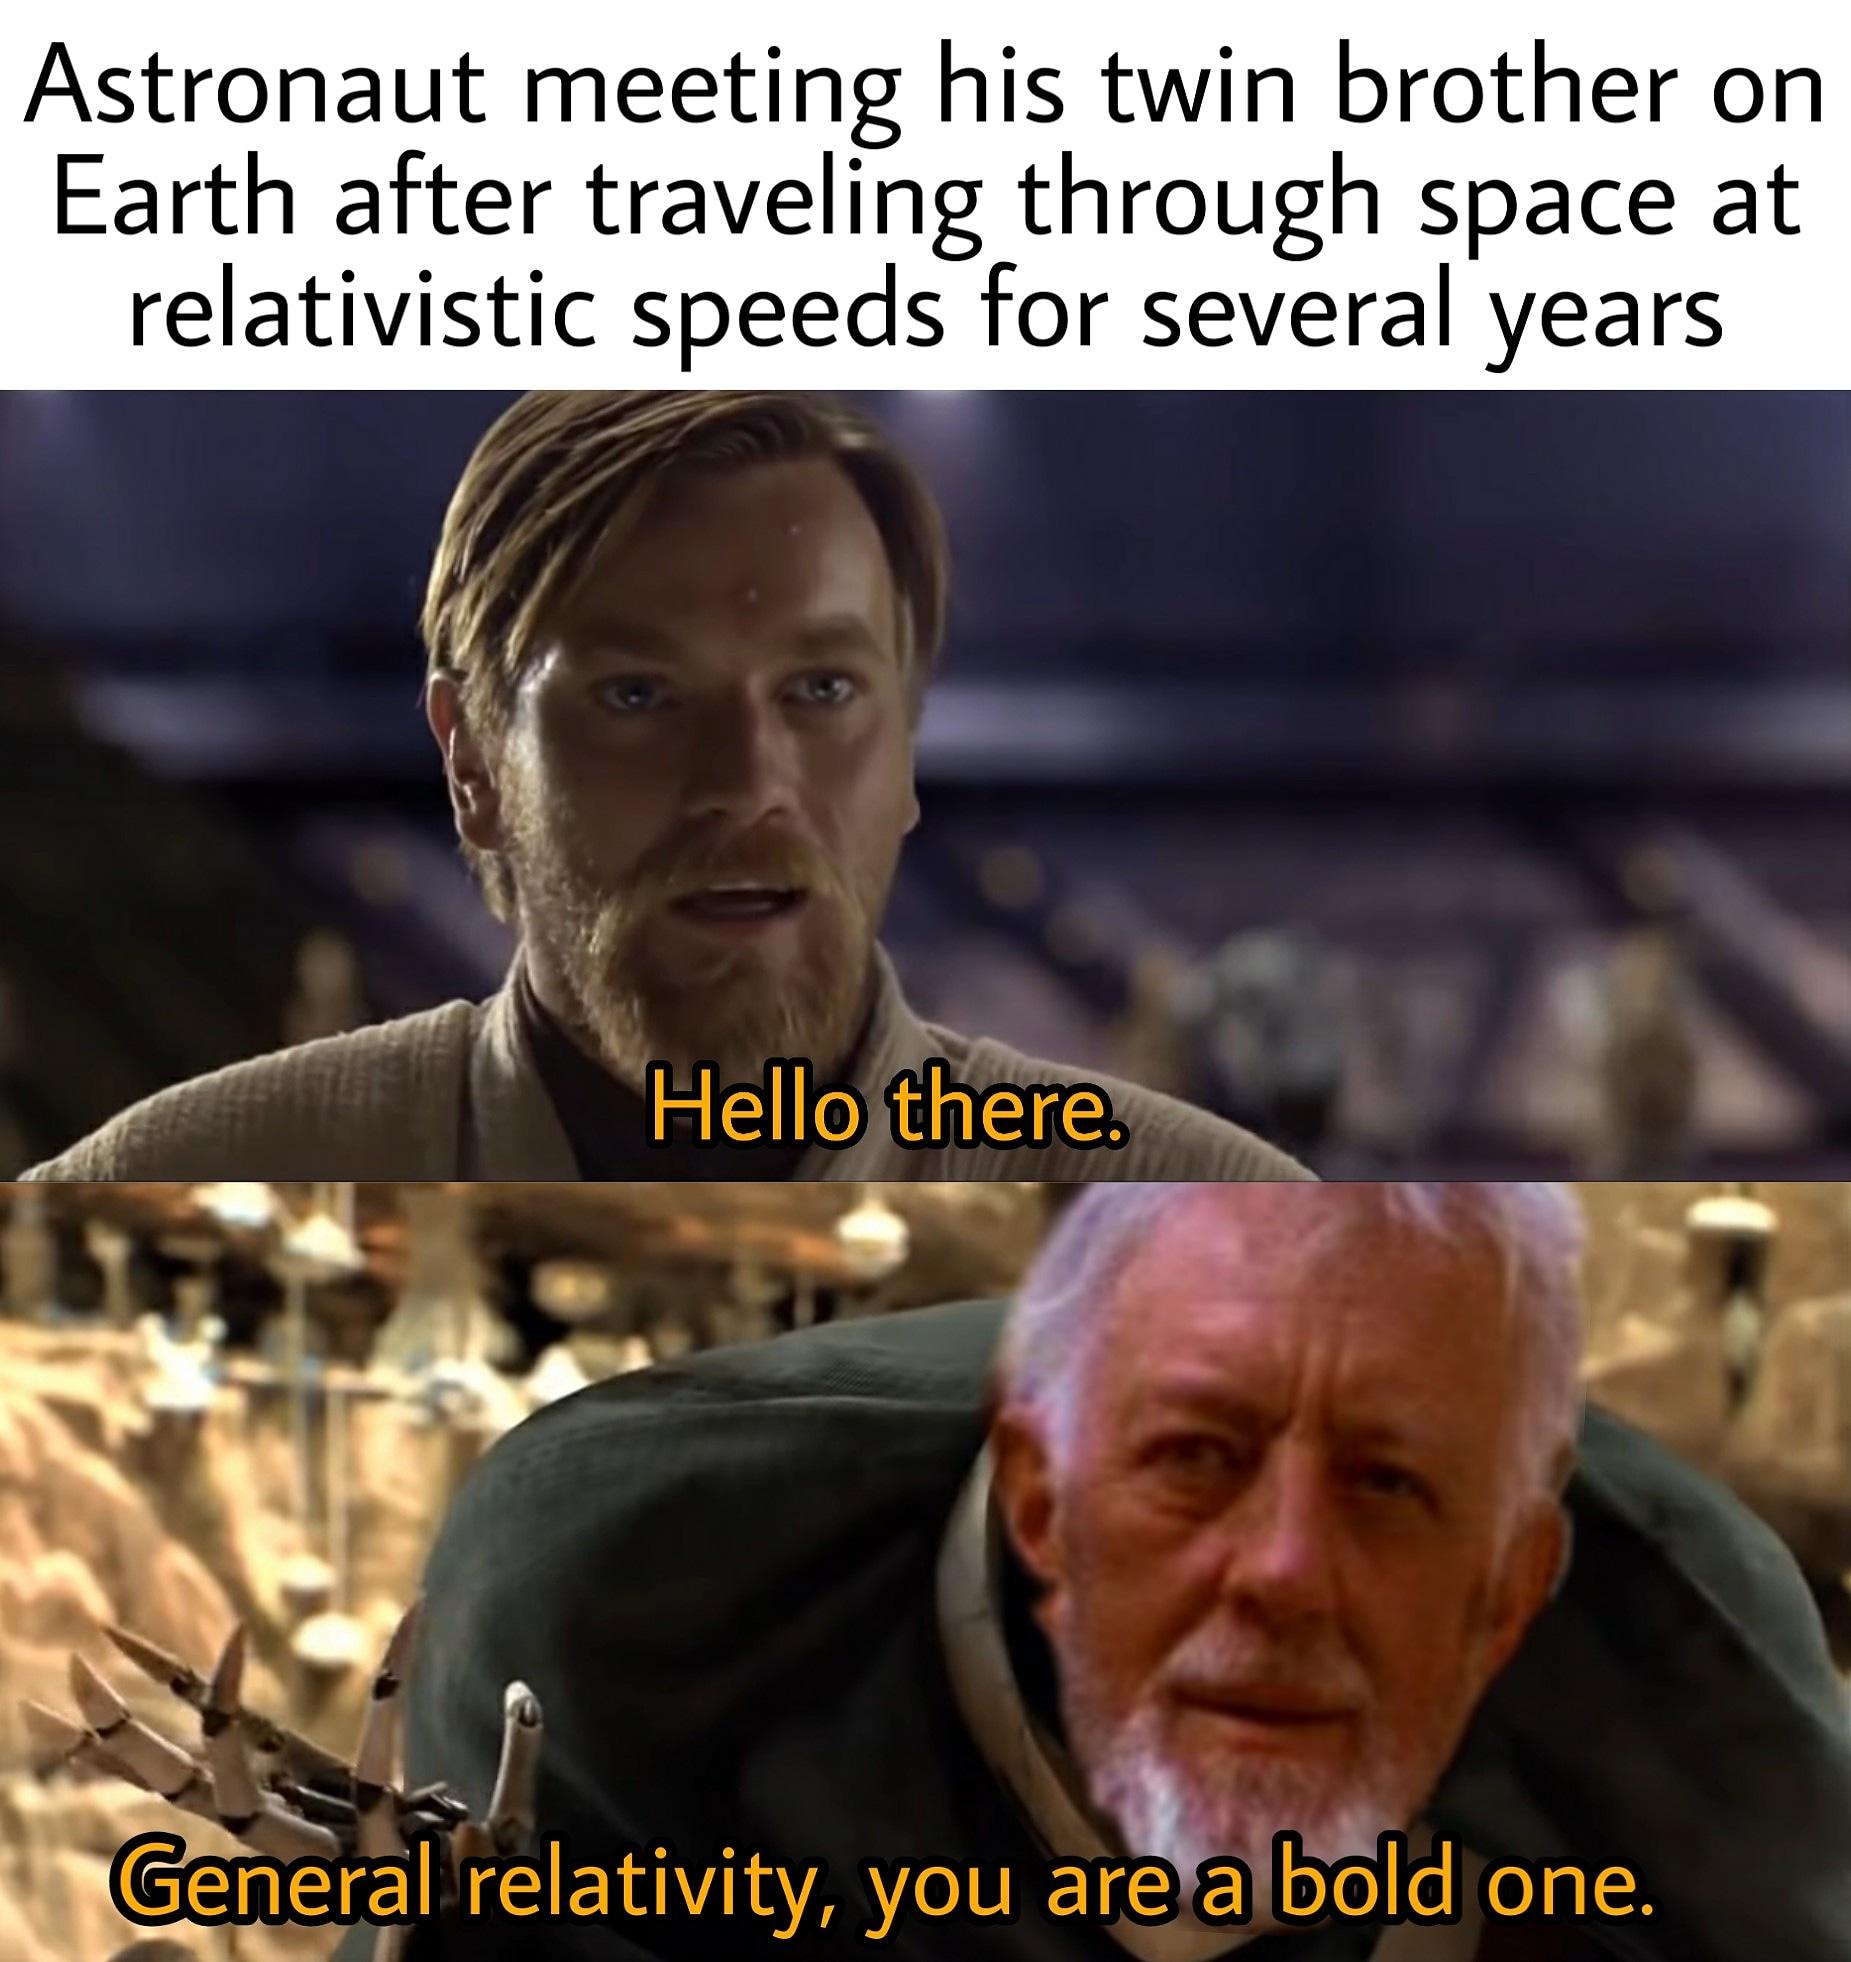 Obi Wan Kenobi Now That S A Name I Haven T Heard In A Long Time